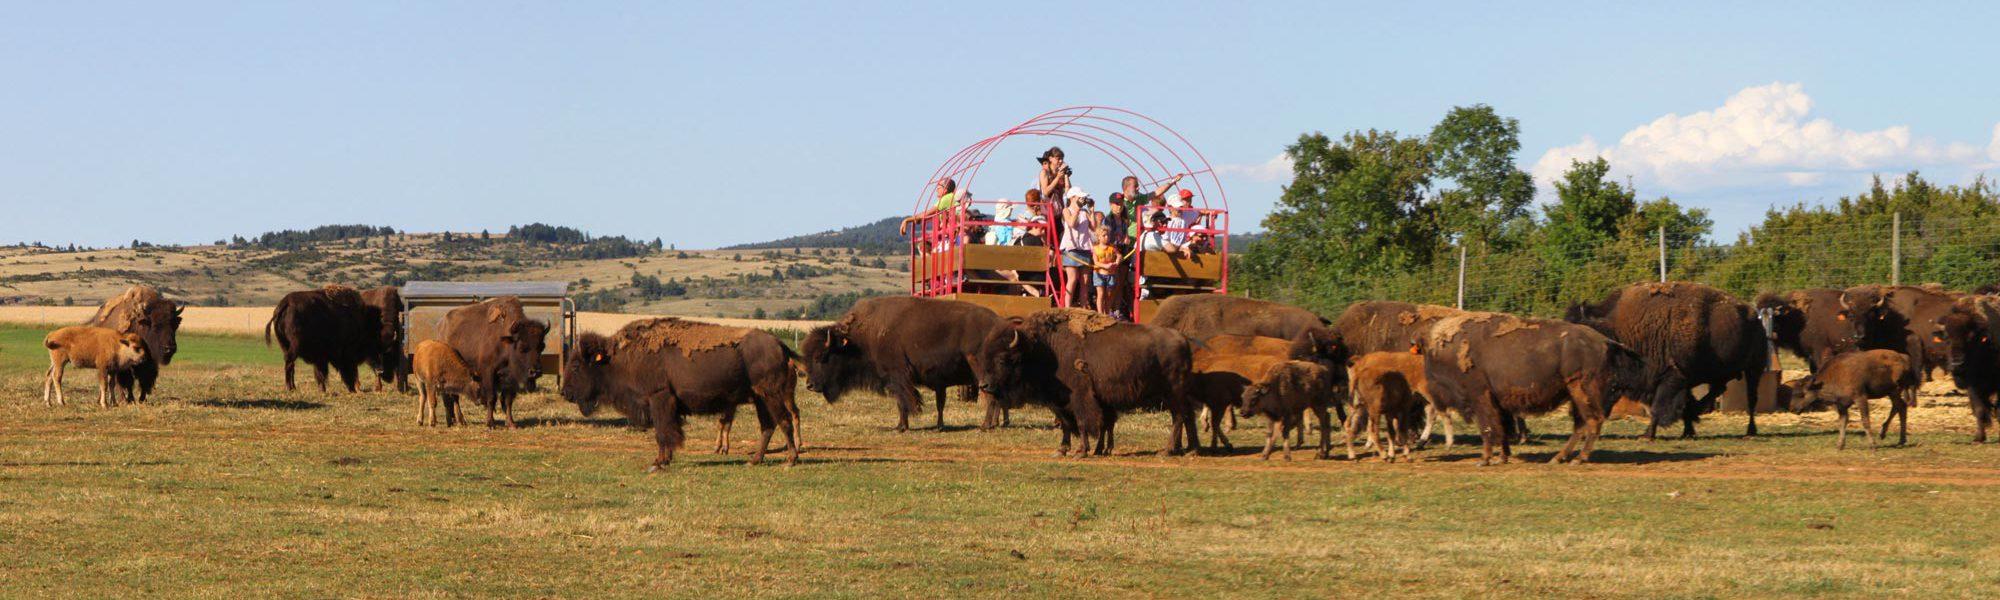 s-chariot-troupeau